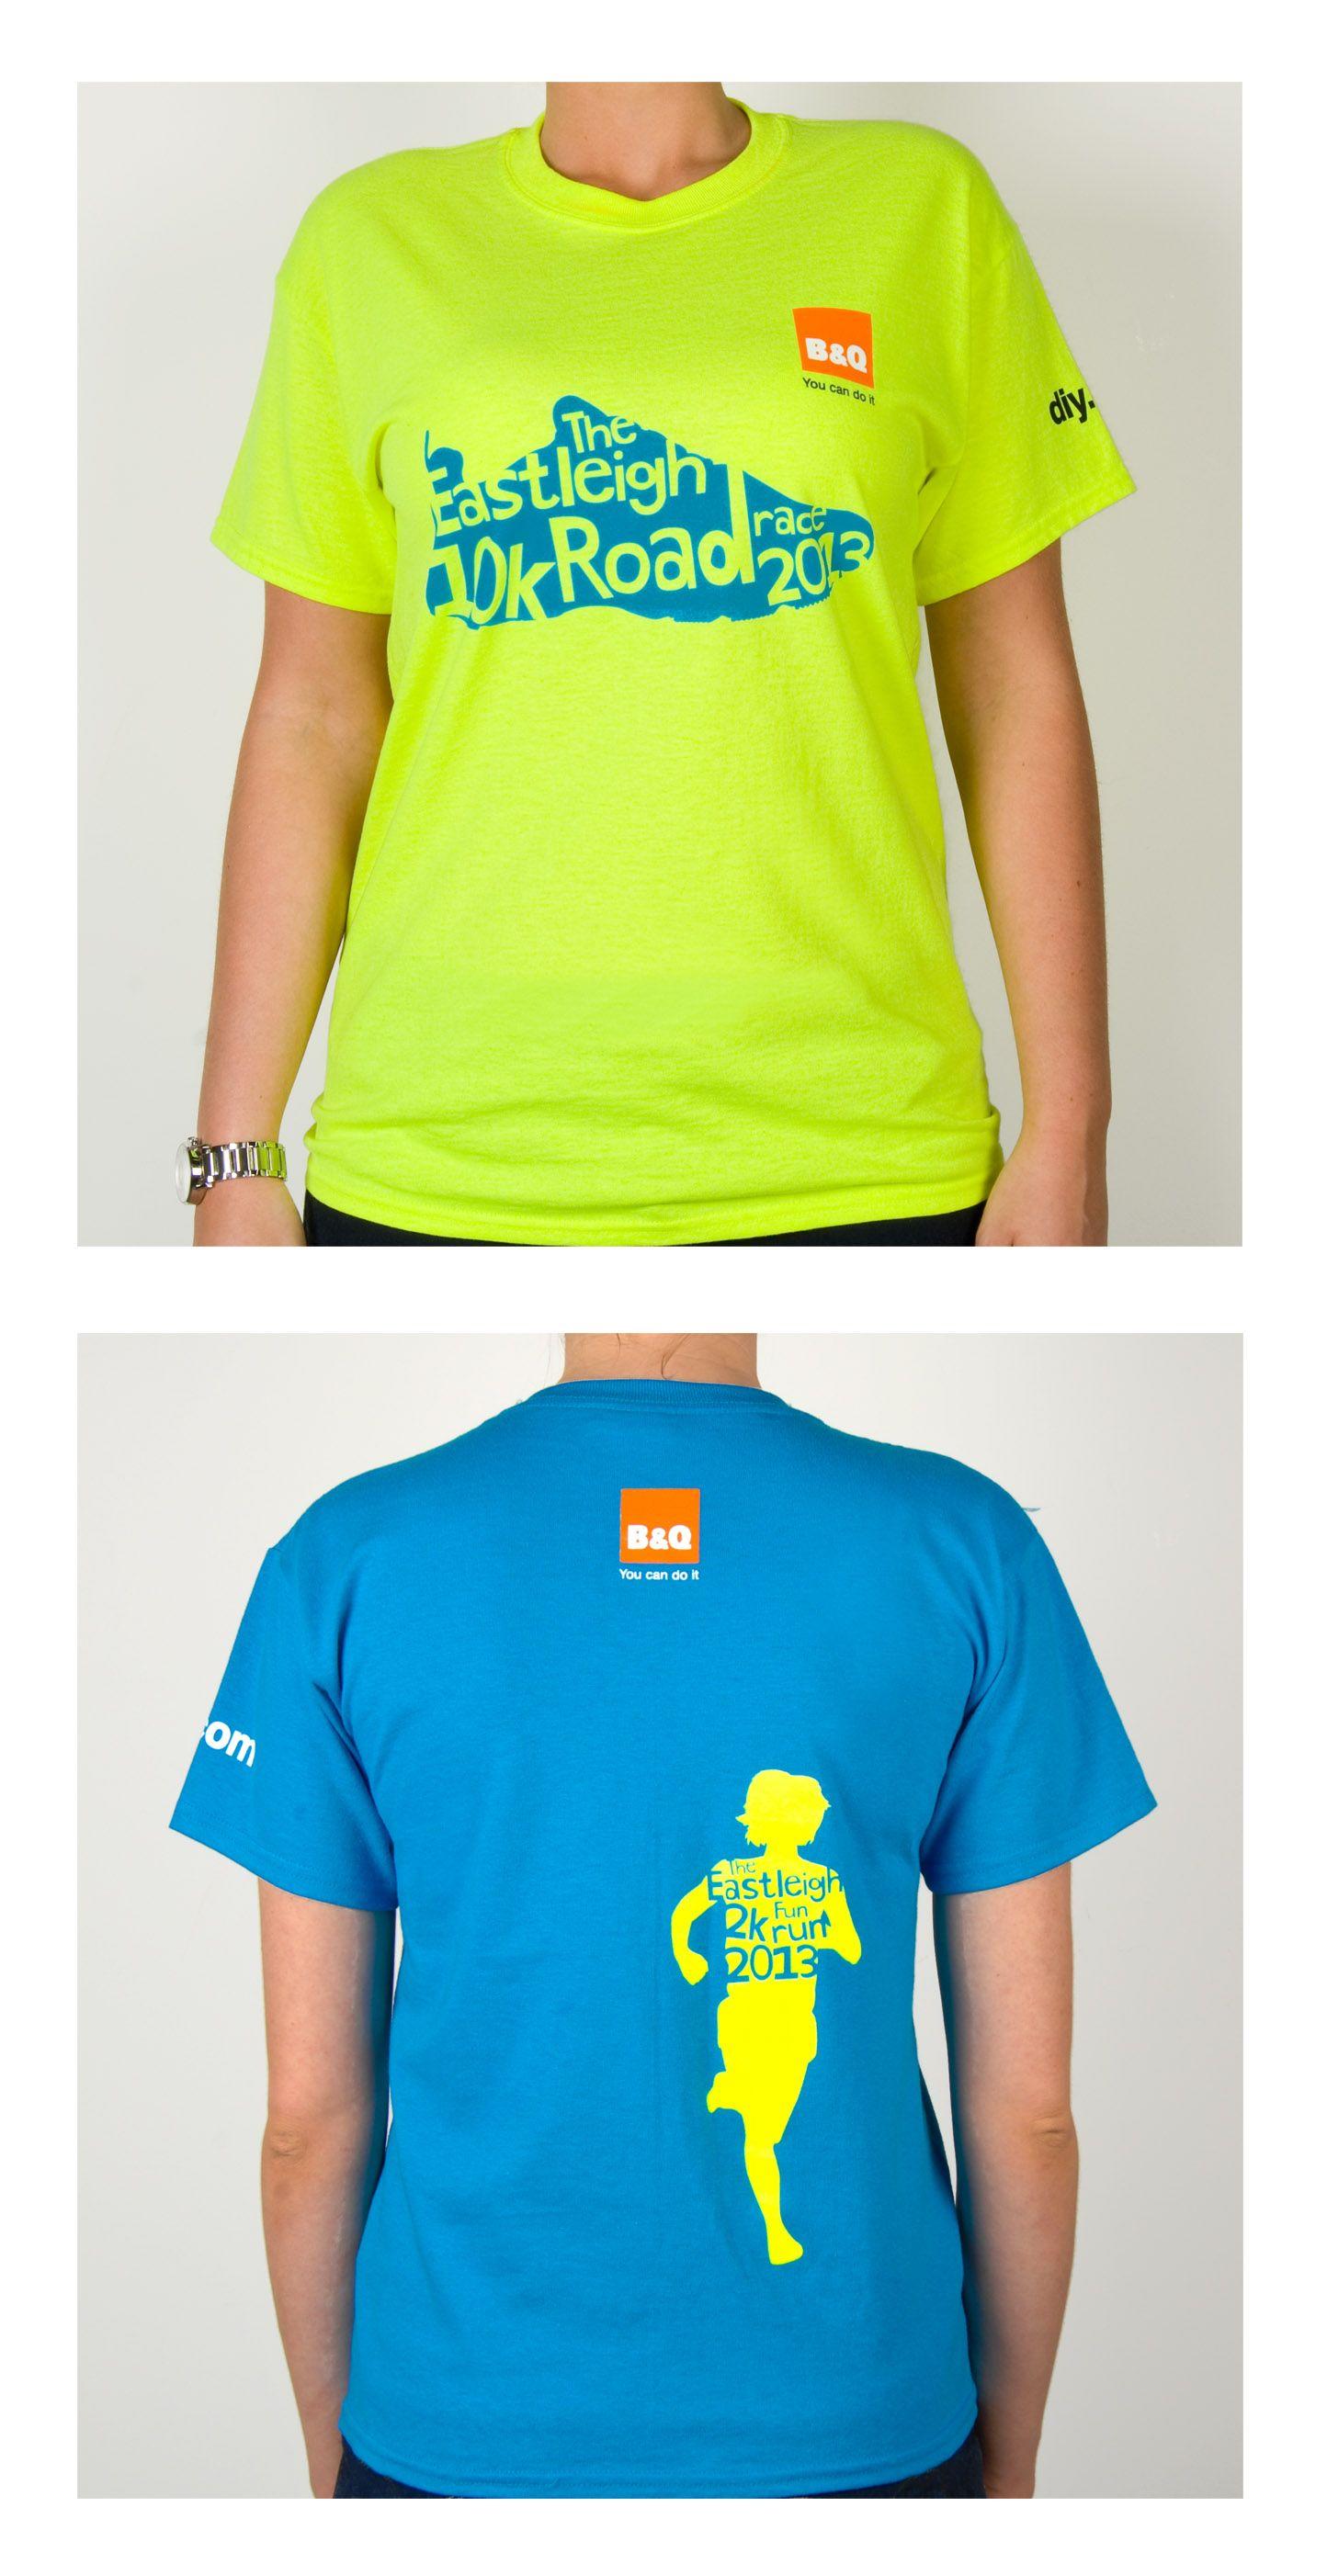 8b612febf2e70 Fluorescent Eastleigh 10k and 2k Fun Run t-shirts 2013   Feels like ...